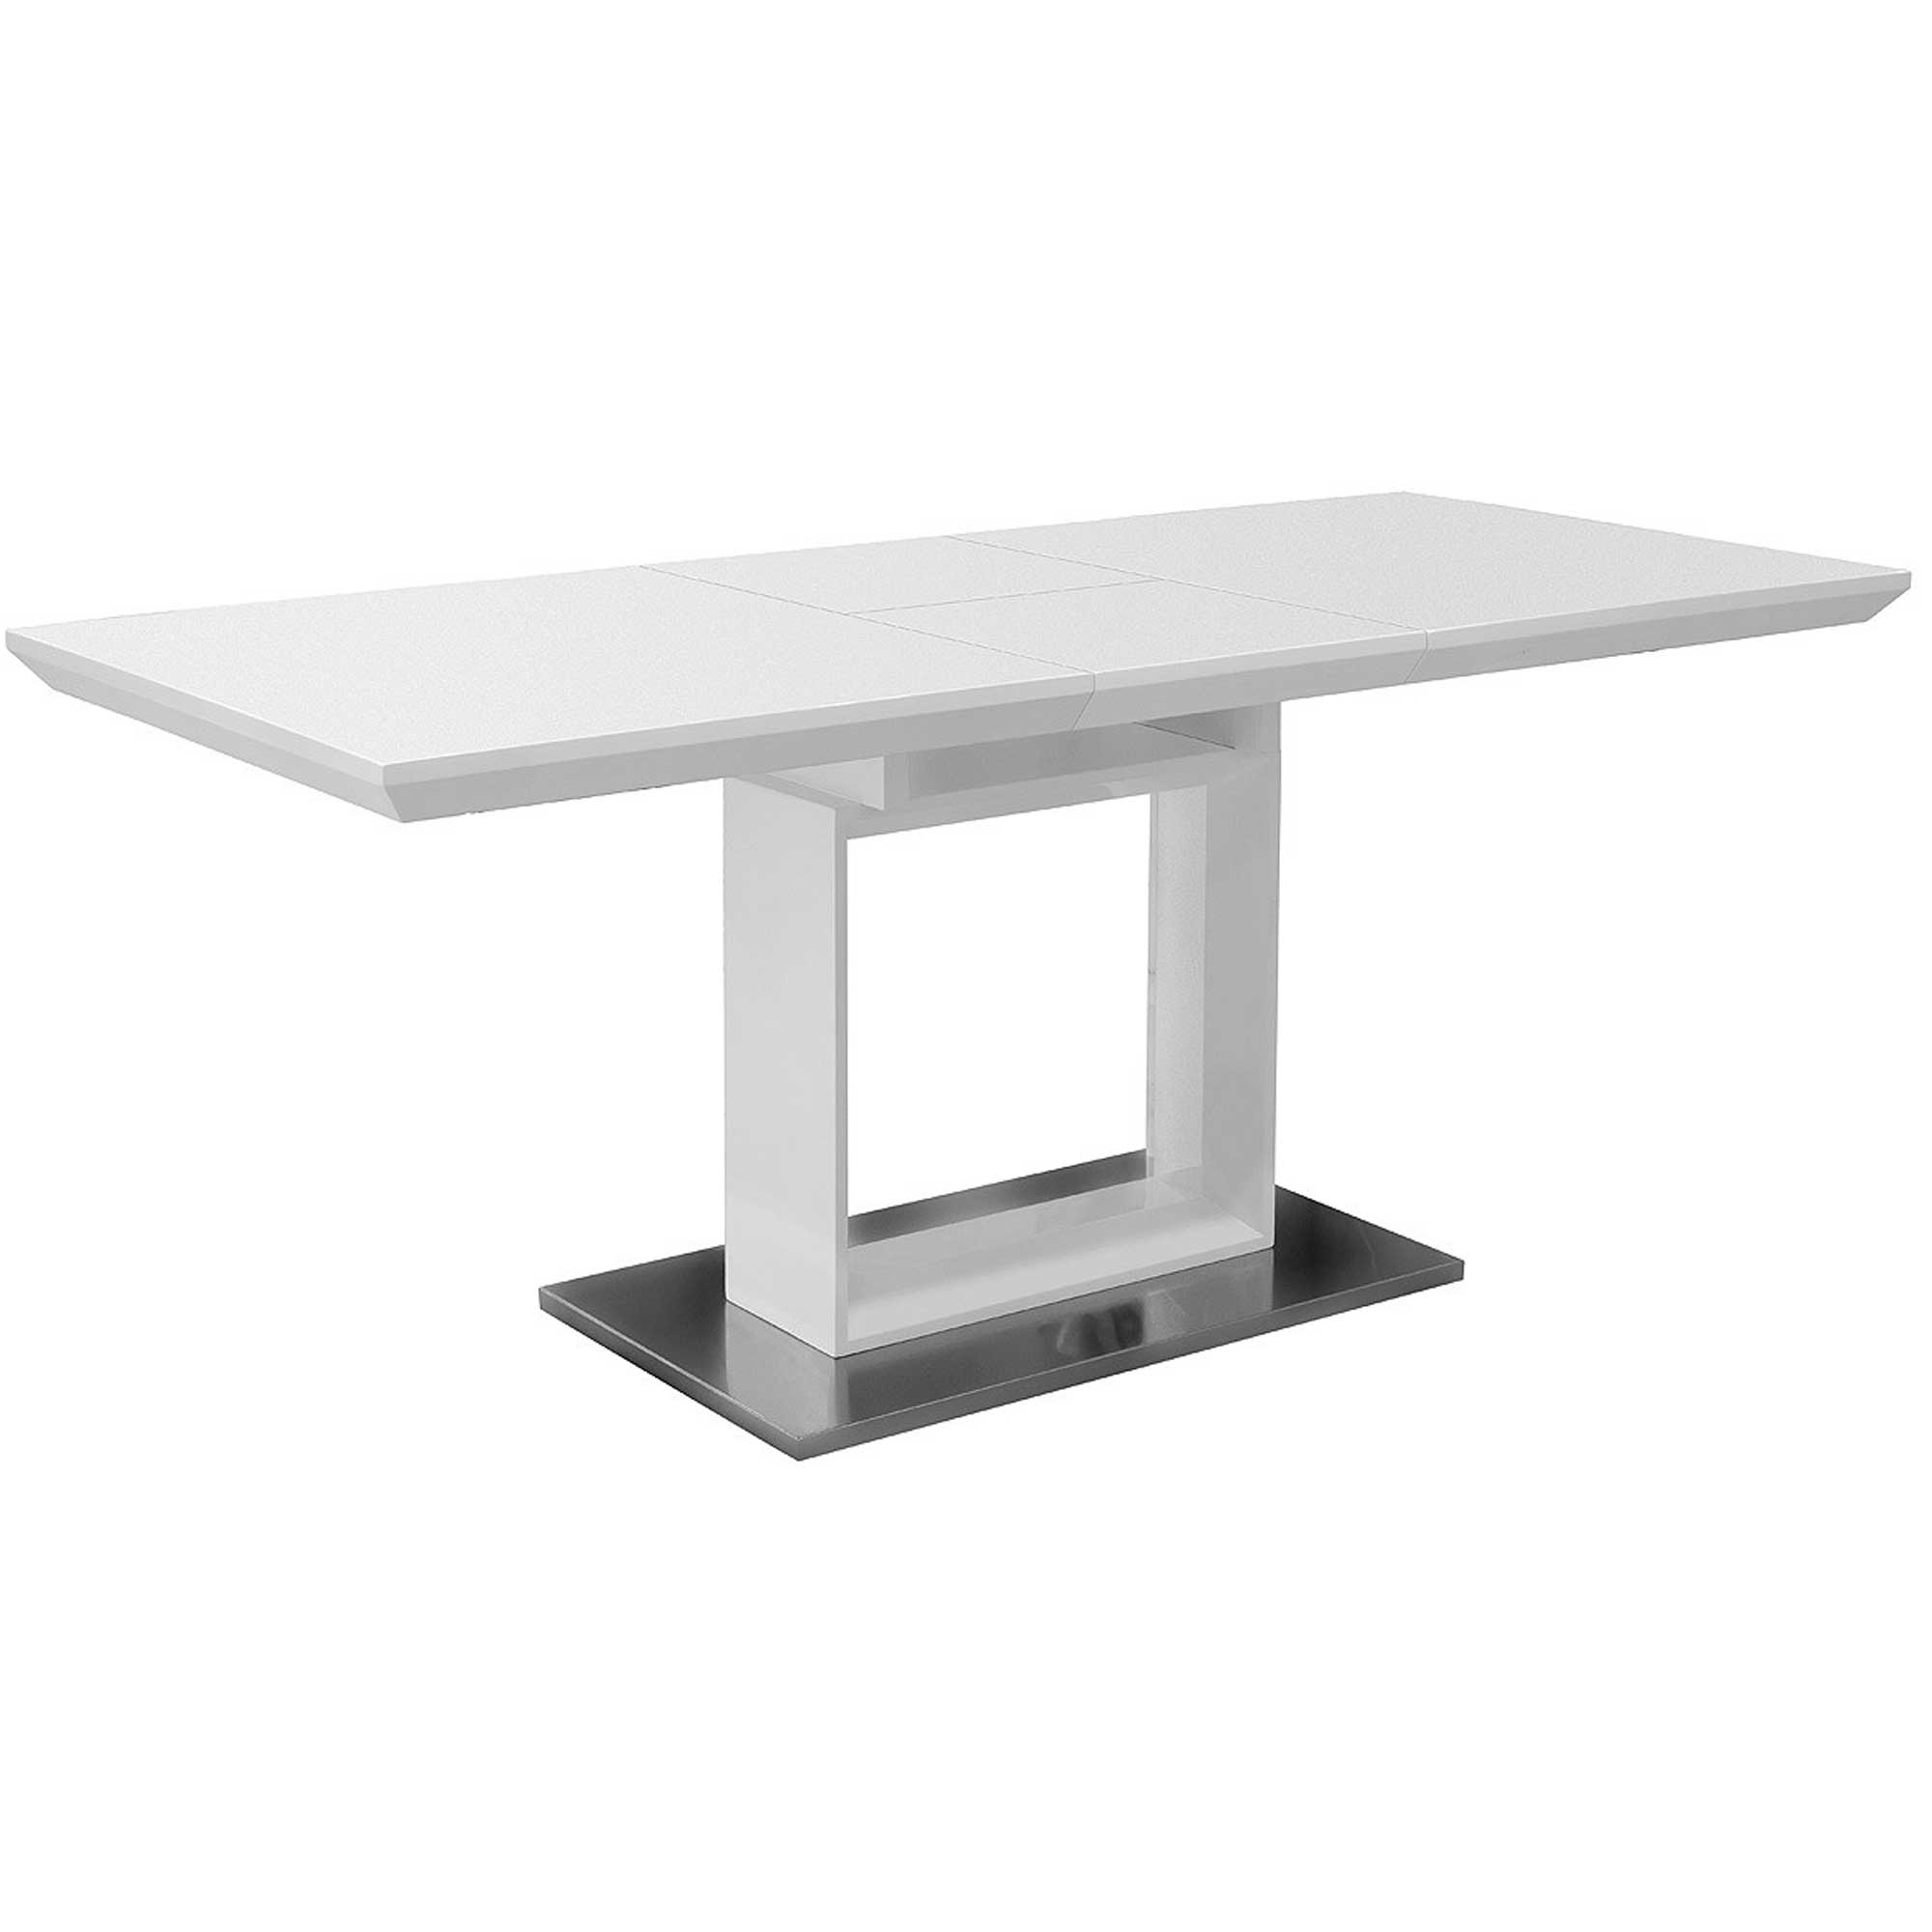 High Gloss White Extending Dining Table